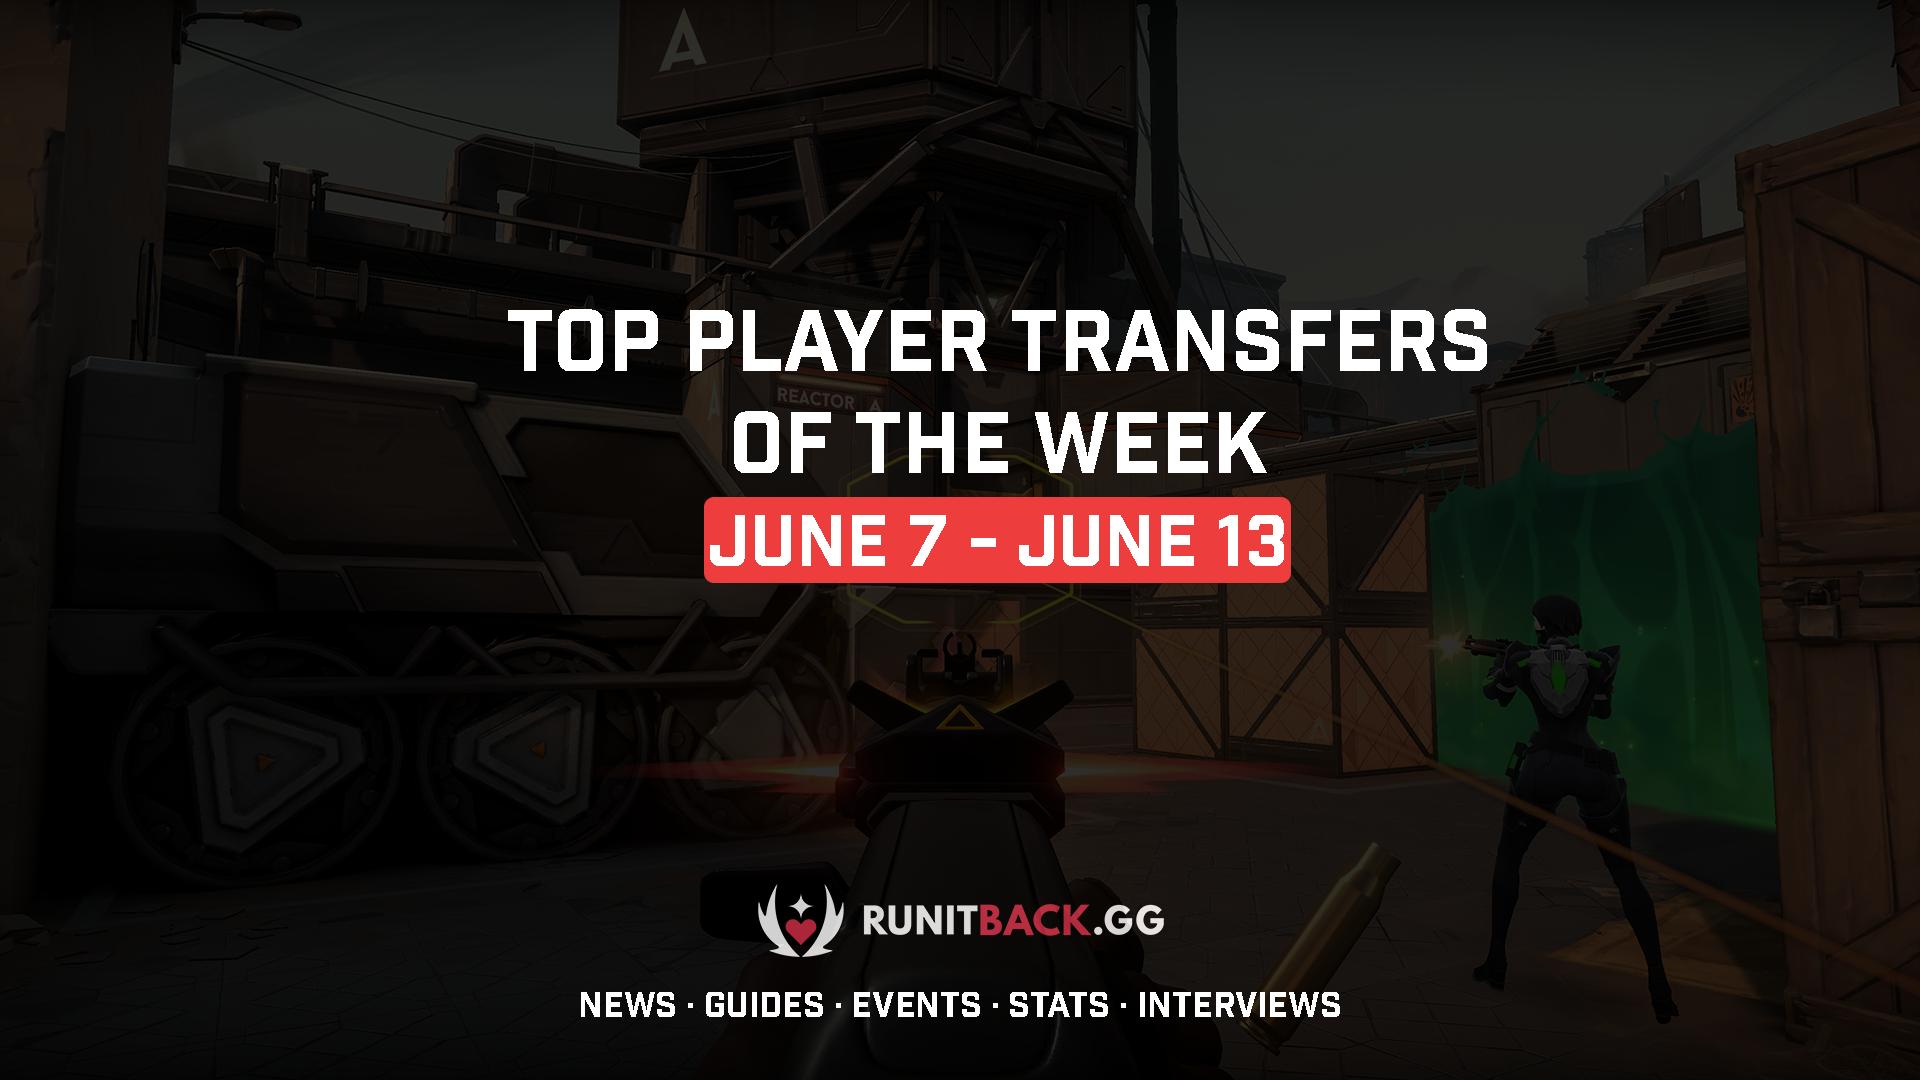 Top Player Transfers of the Week: June 7 – June 13